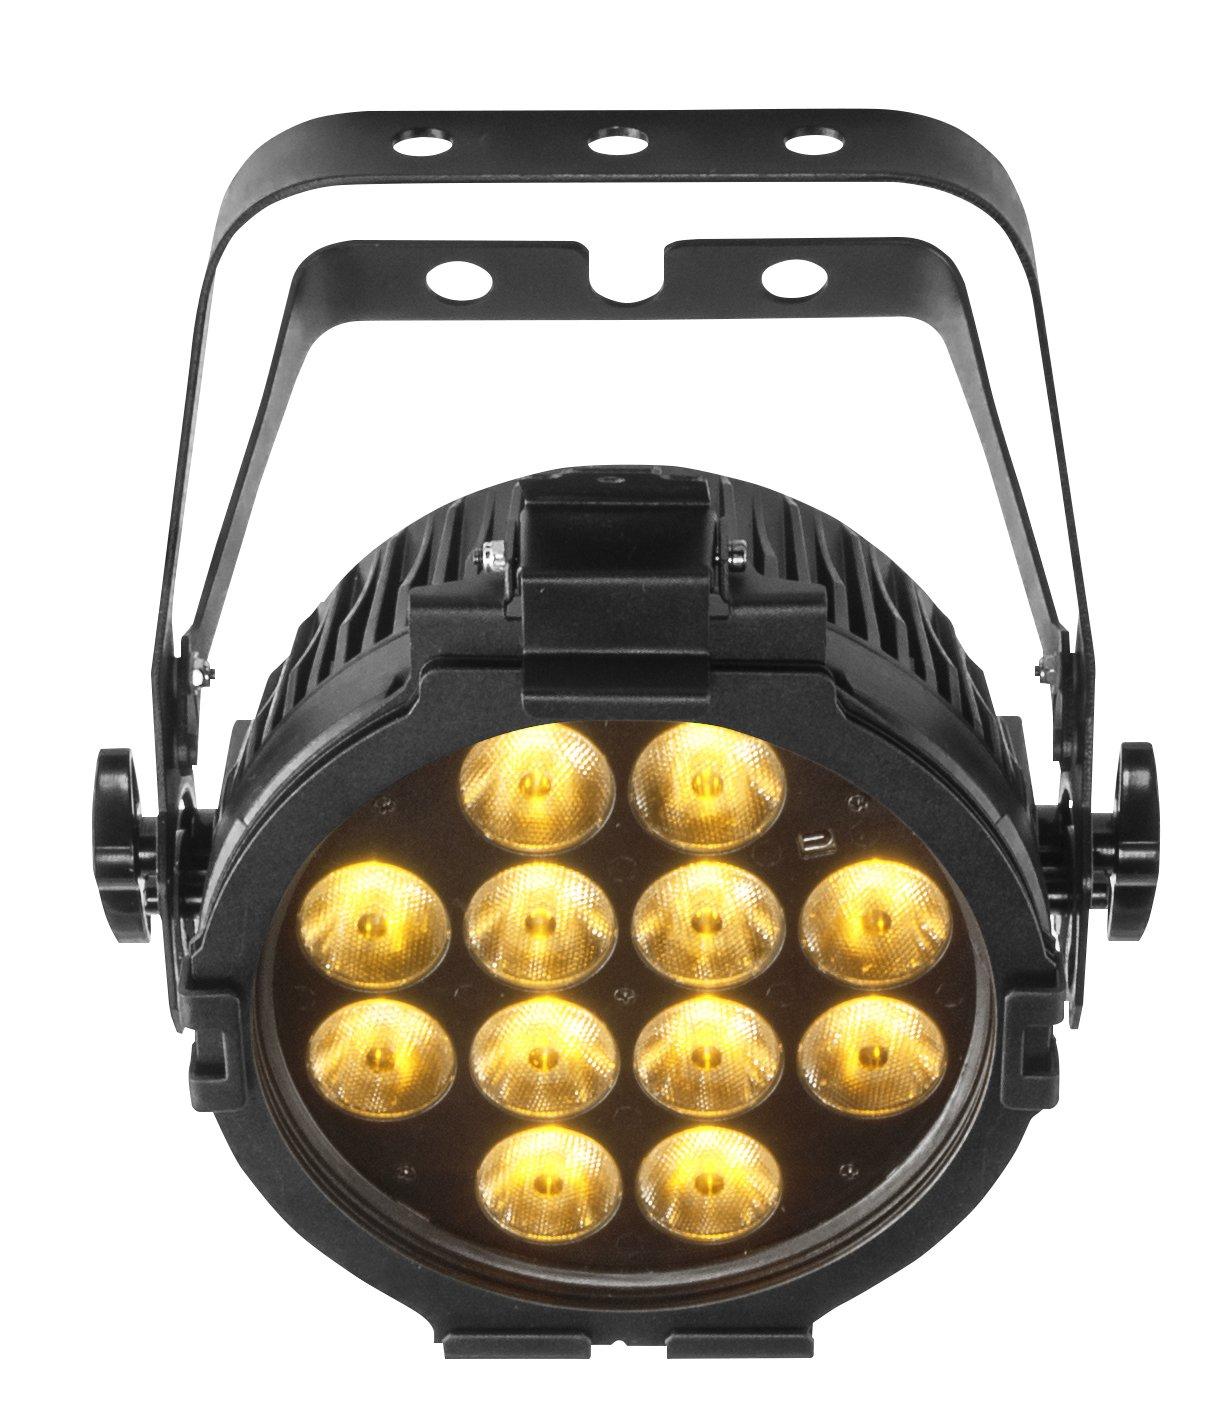 CHAUVET DJ SlimPAR Pro W USB Variable White LED Par/Wash Light | LED Lighting